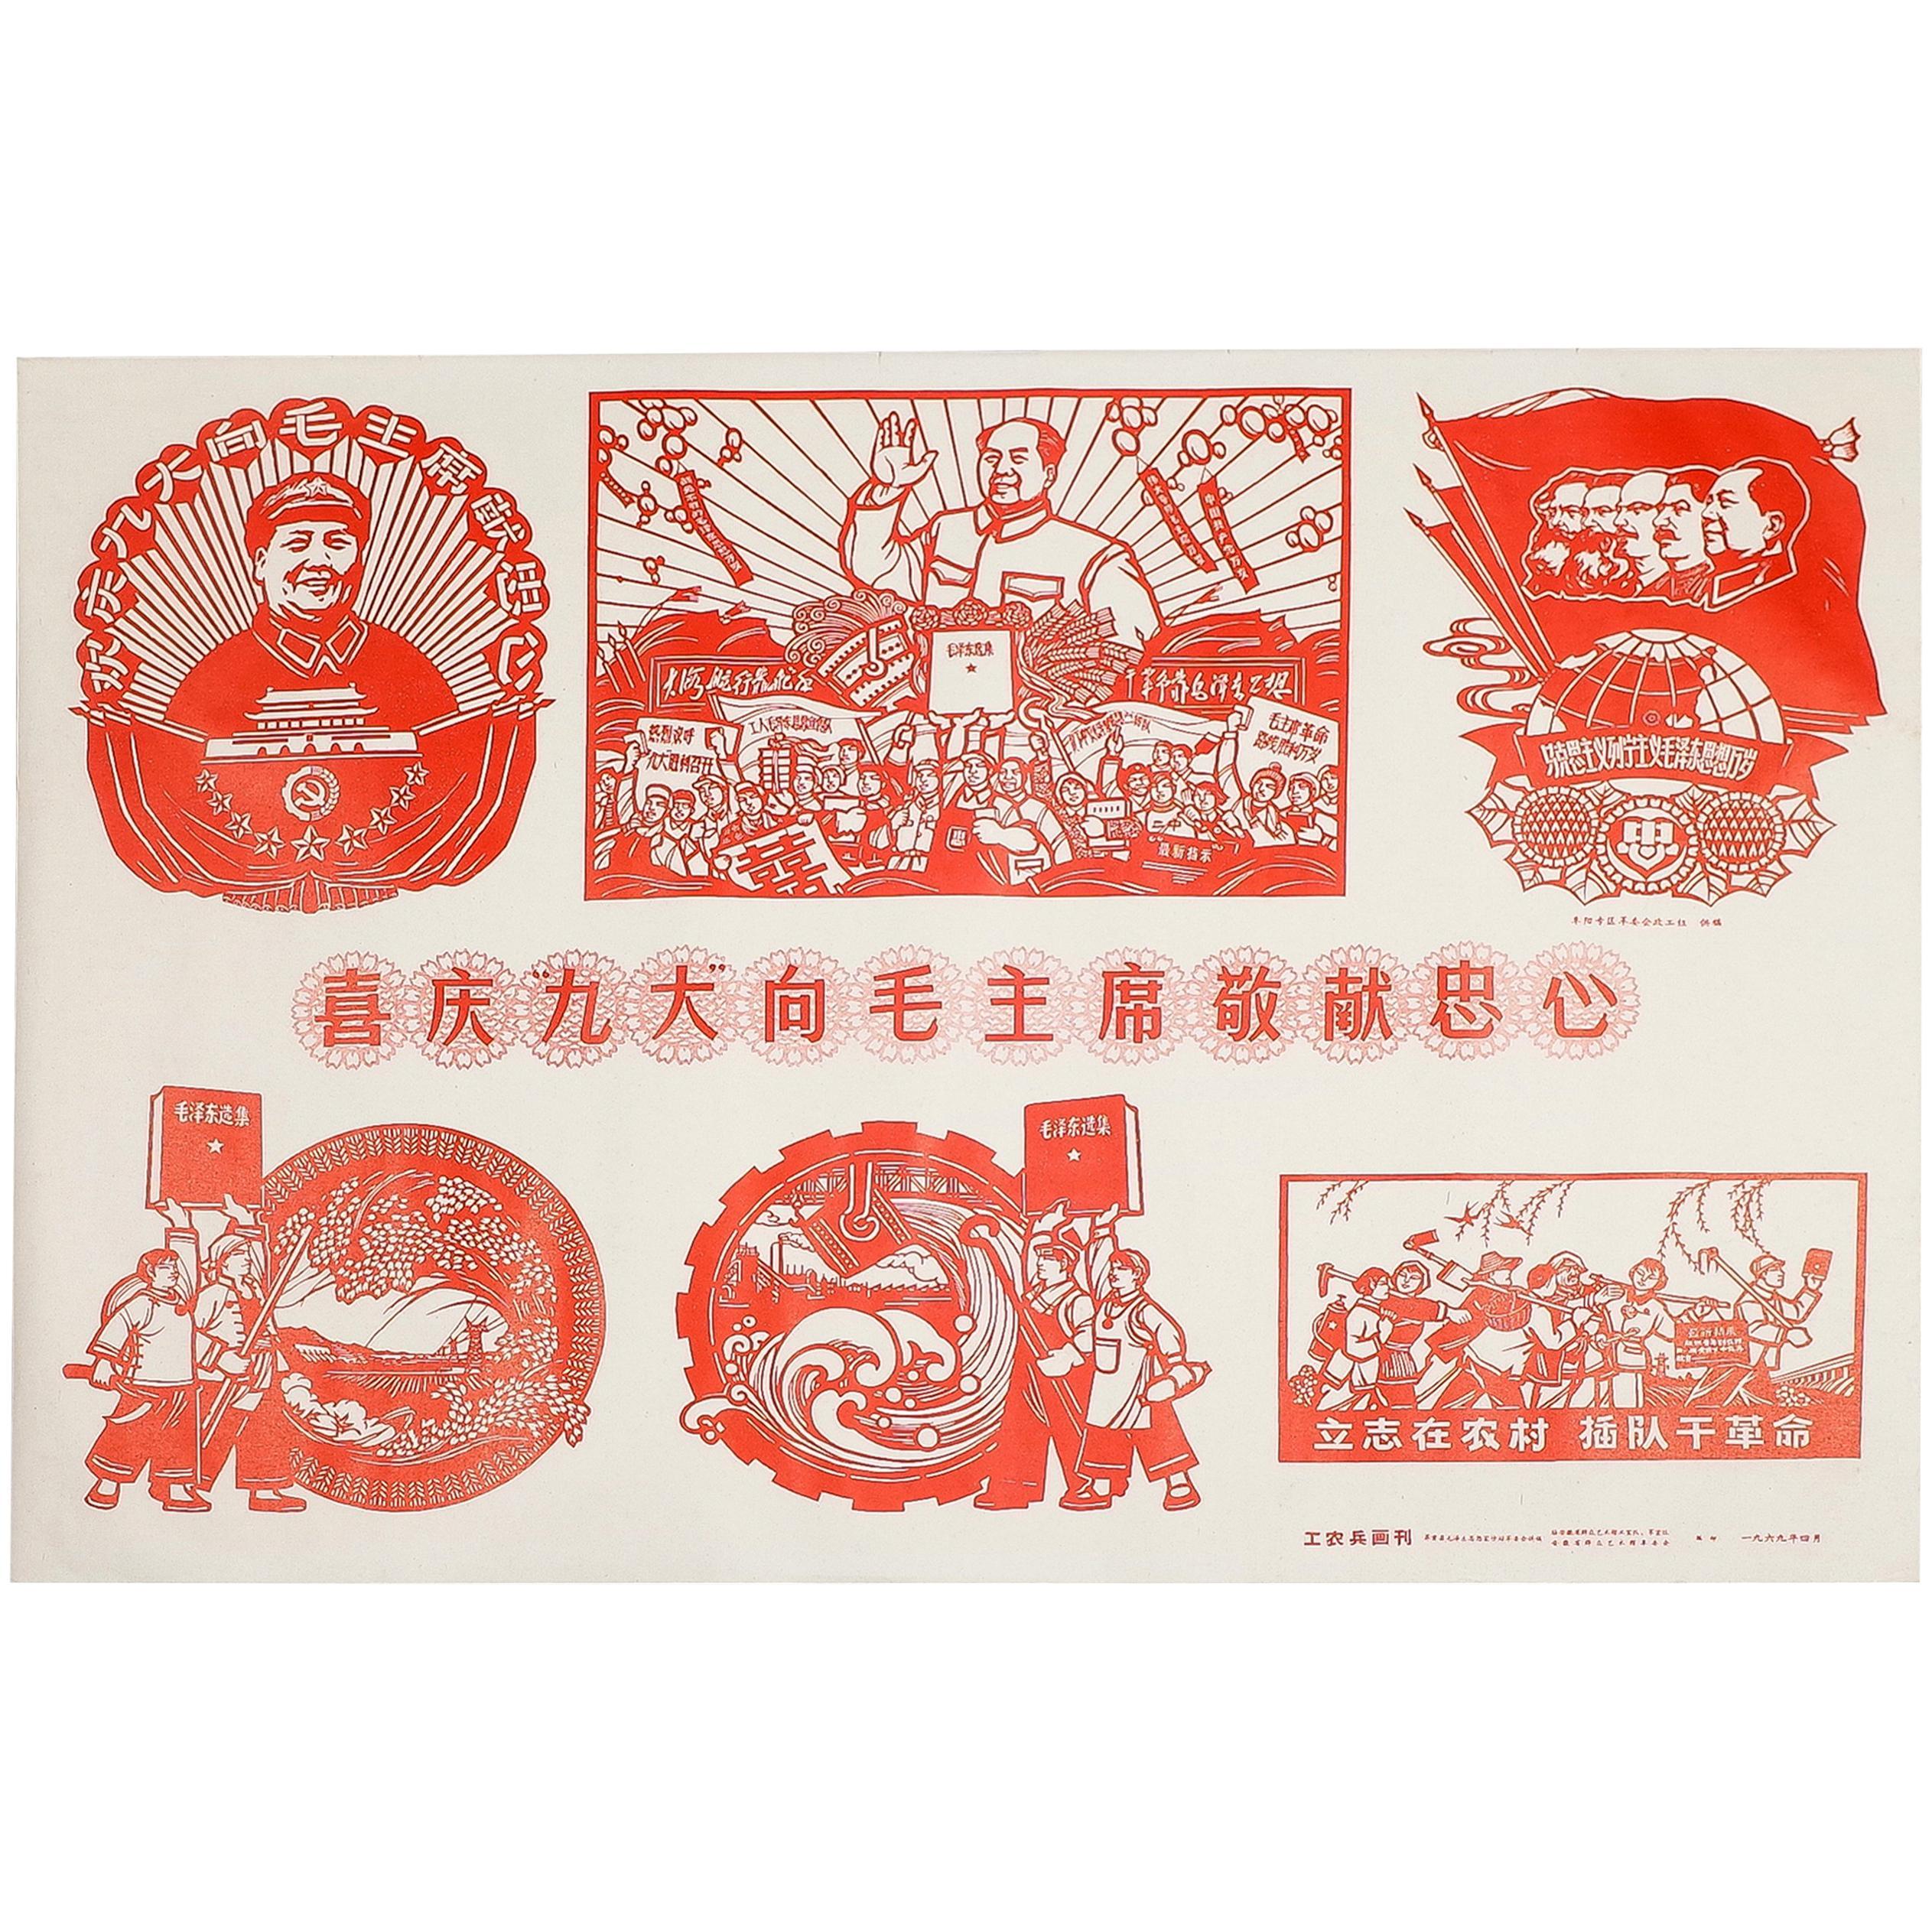 Original Mao Propaganda Poster, 1969